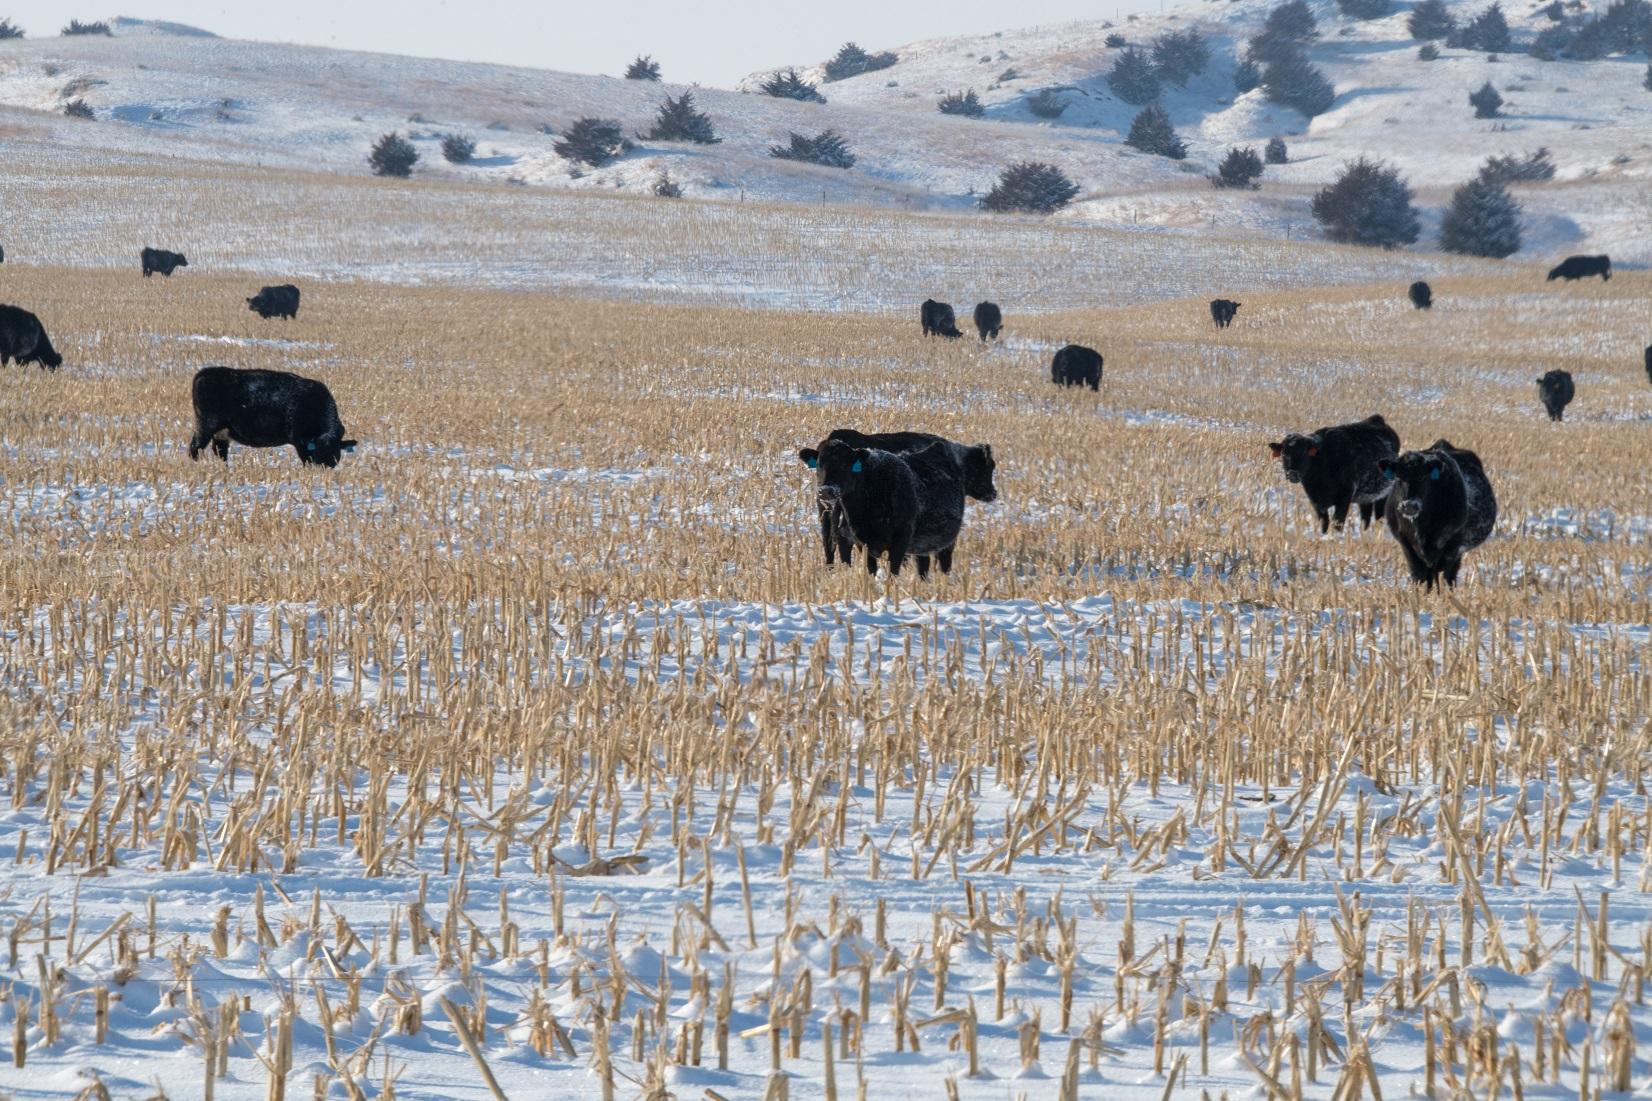 Cows grazing corn residue